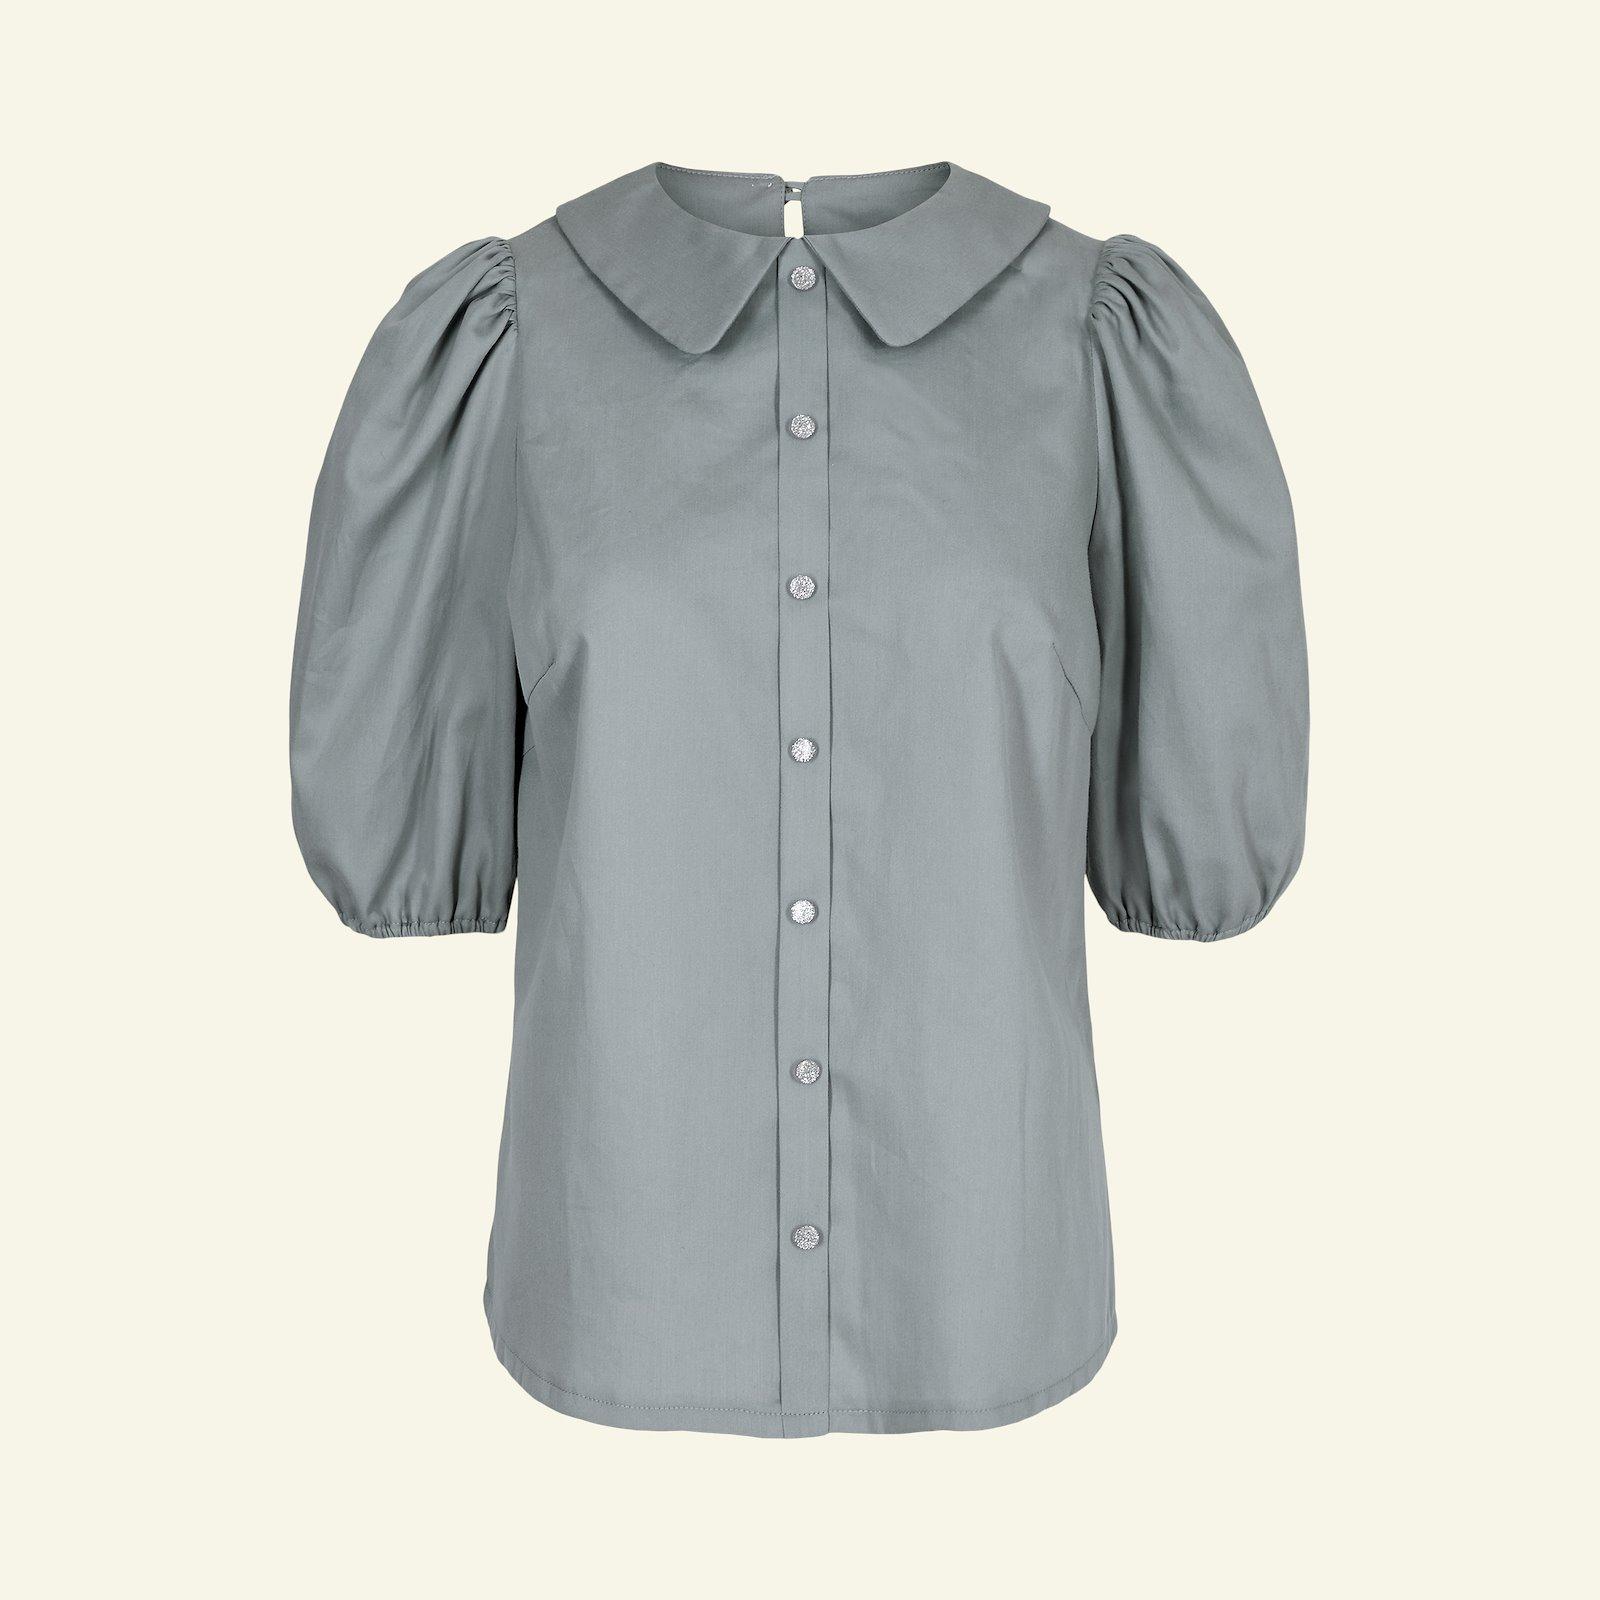 Design your own blouse p22075_816252_40589_sskit